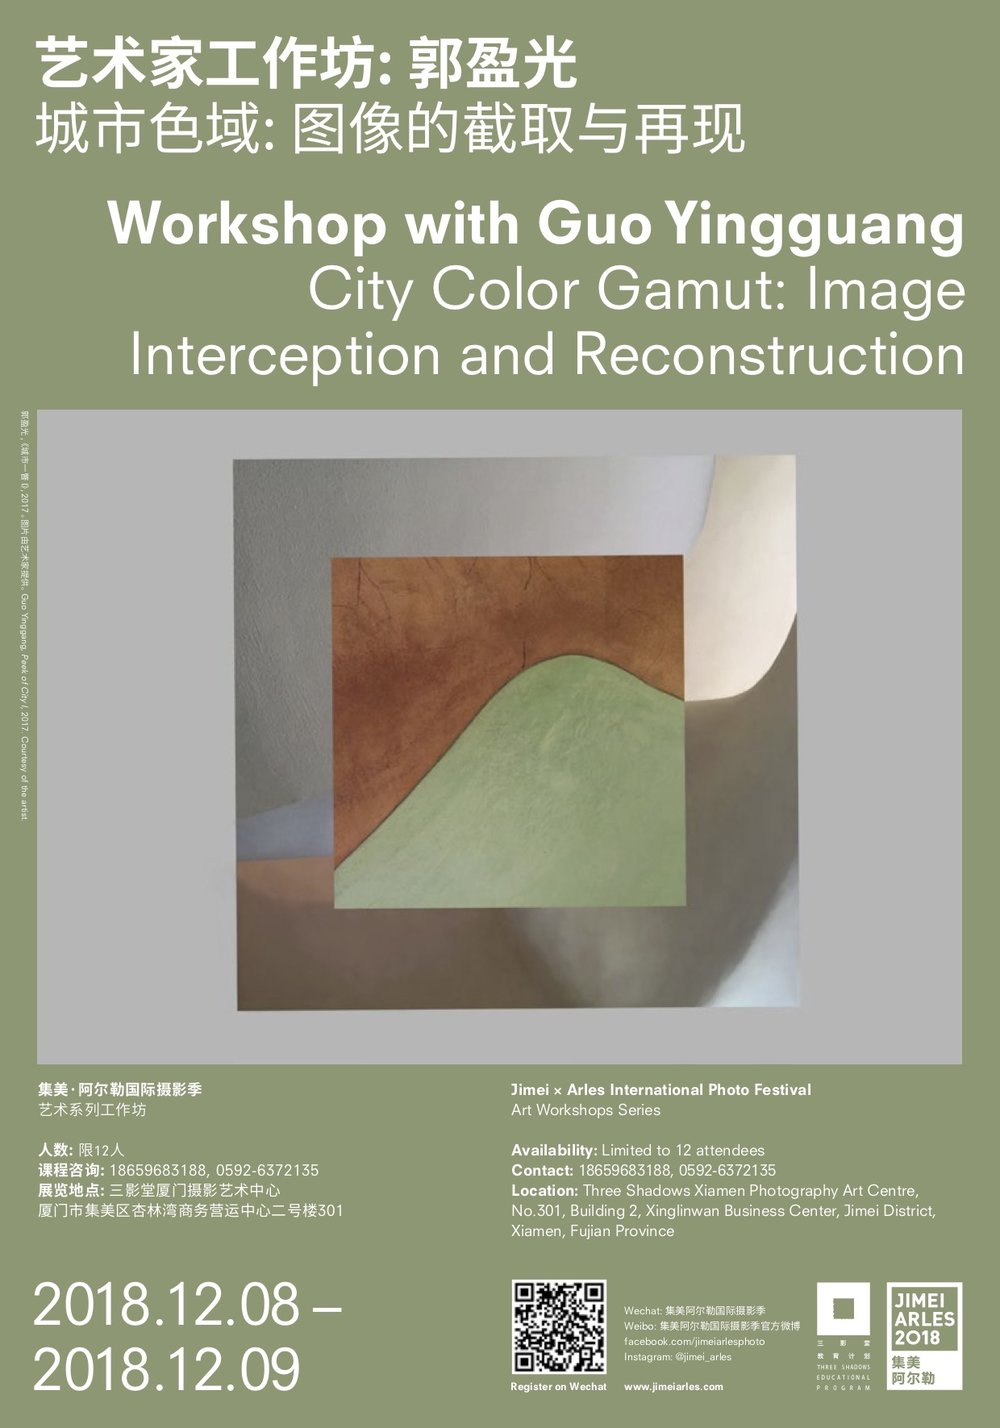 JIMEIARLES_Workshop Poster_Digital_Guo_Yingguang.jpg